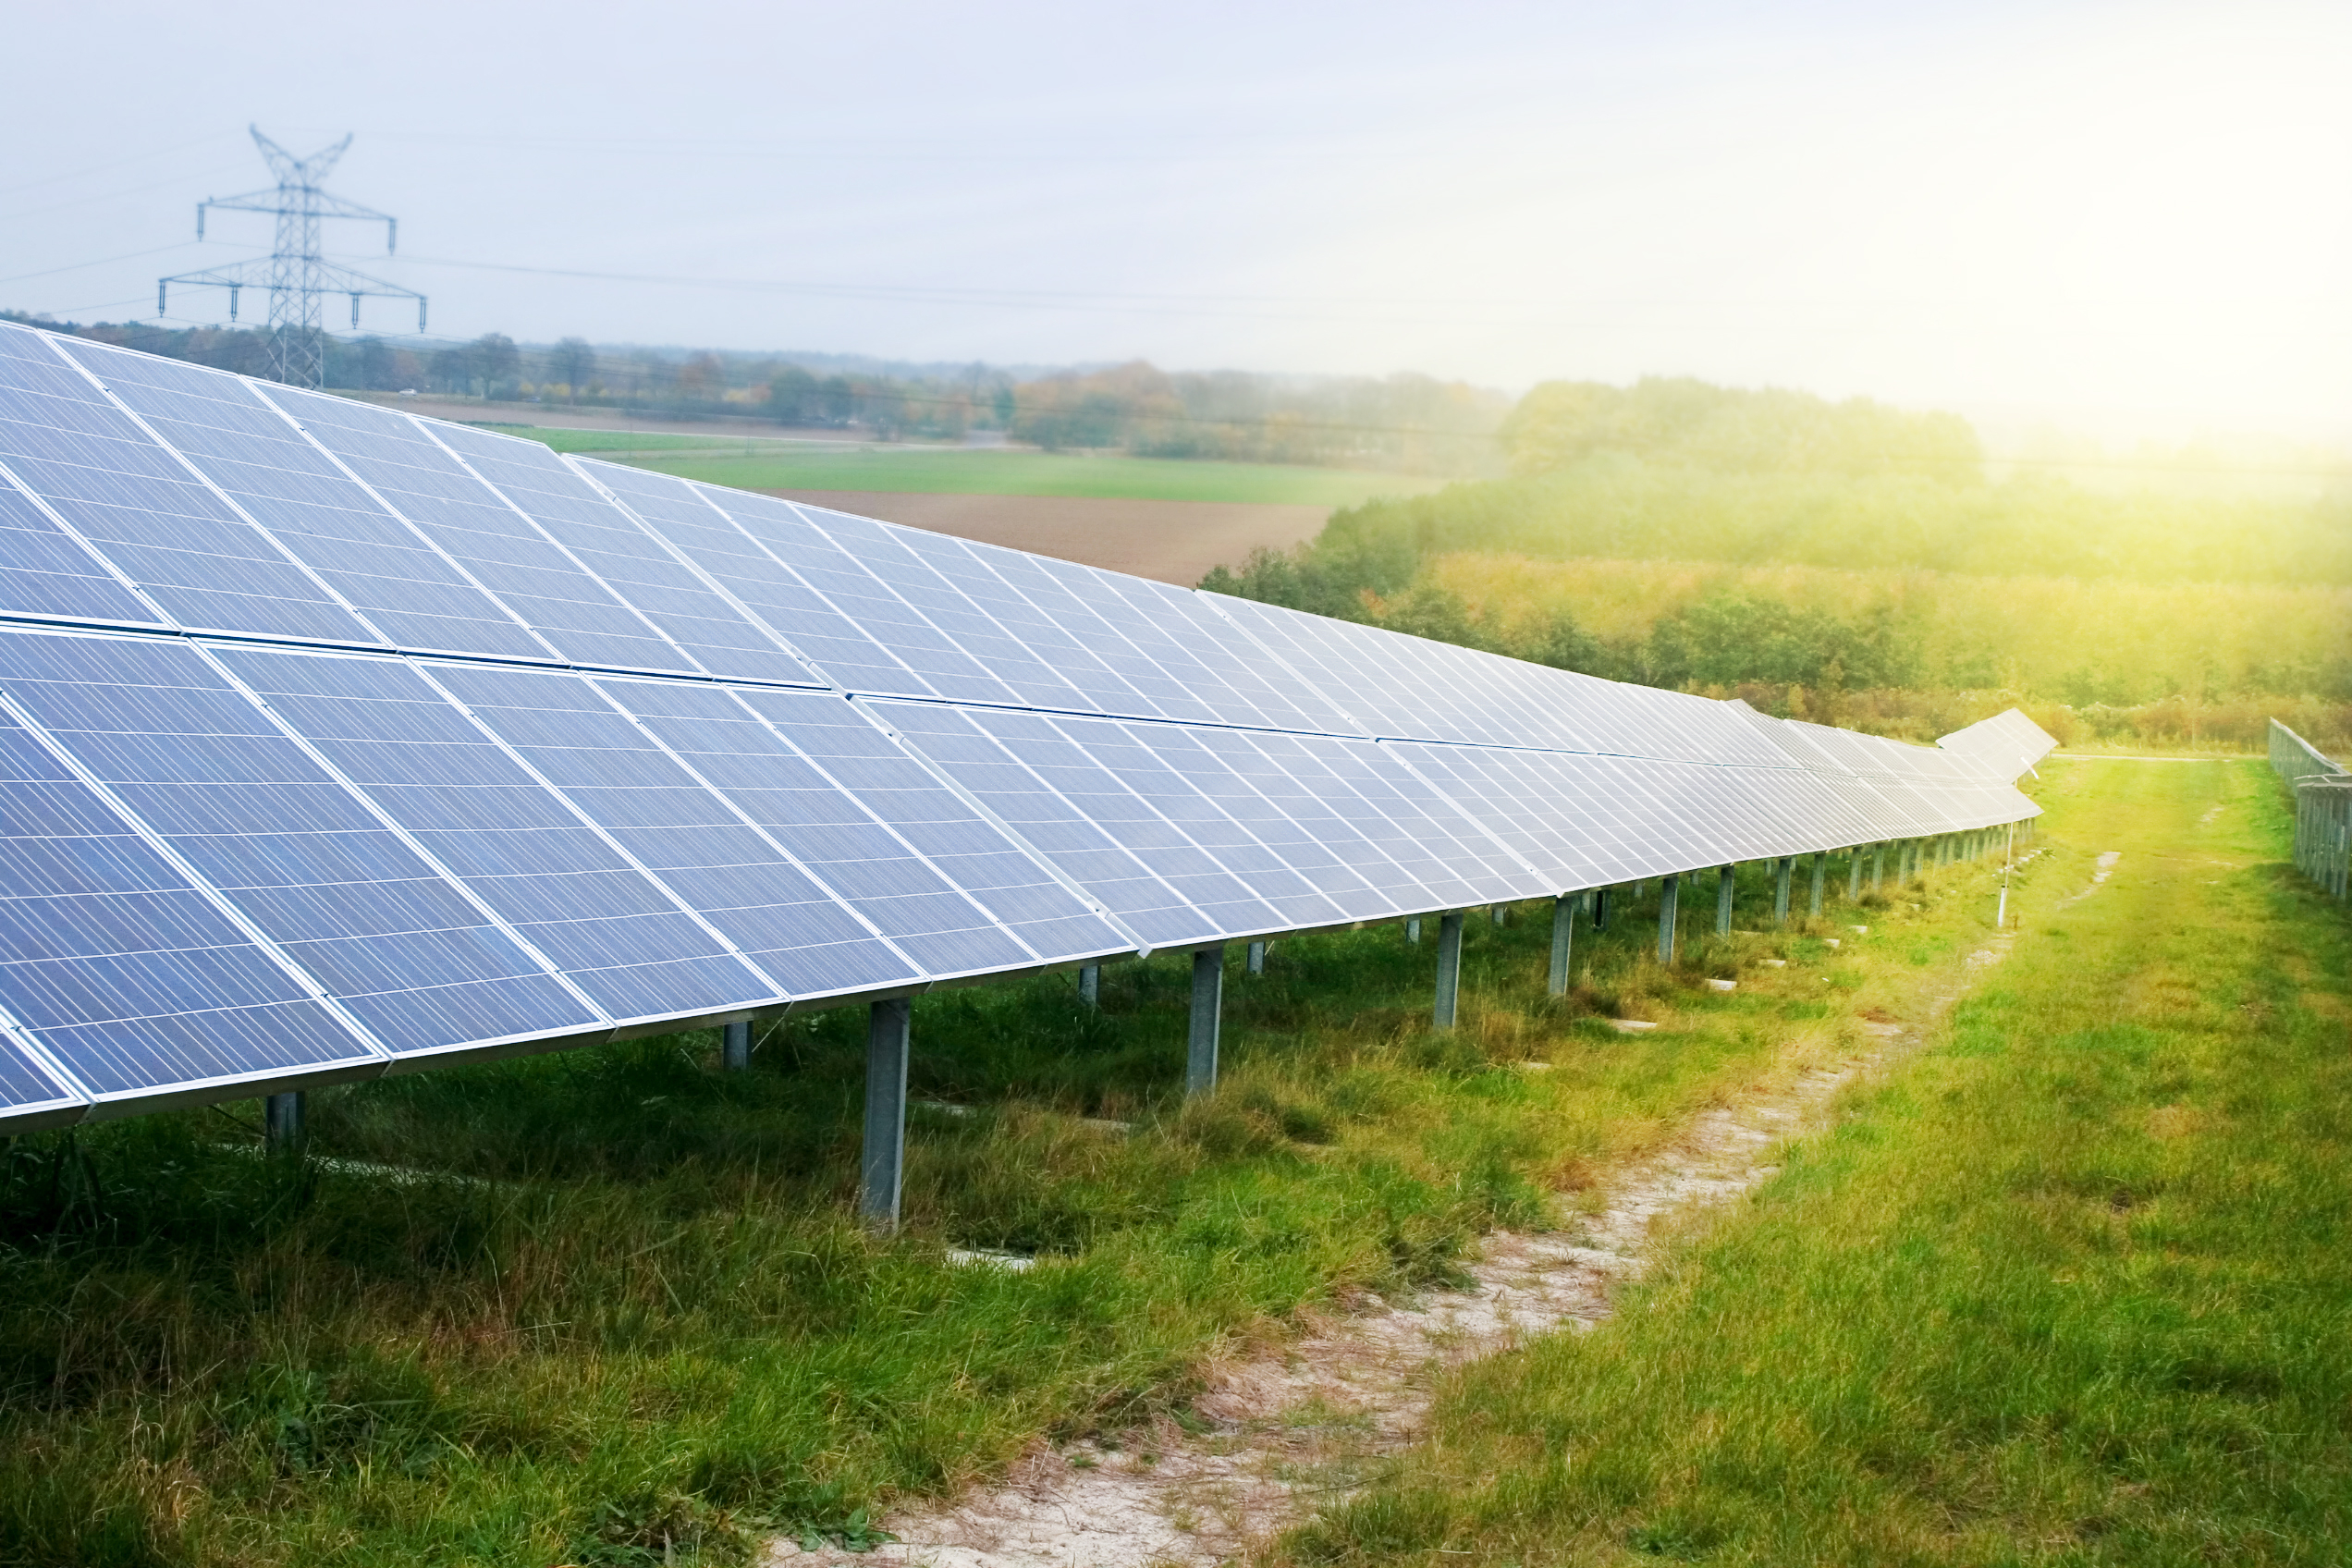 solar shutterstock_1076055119